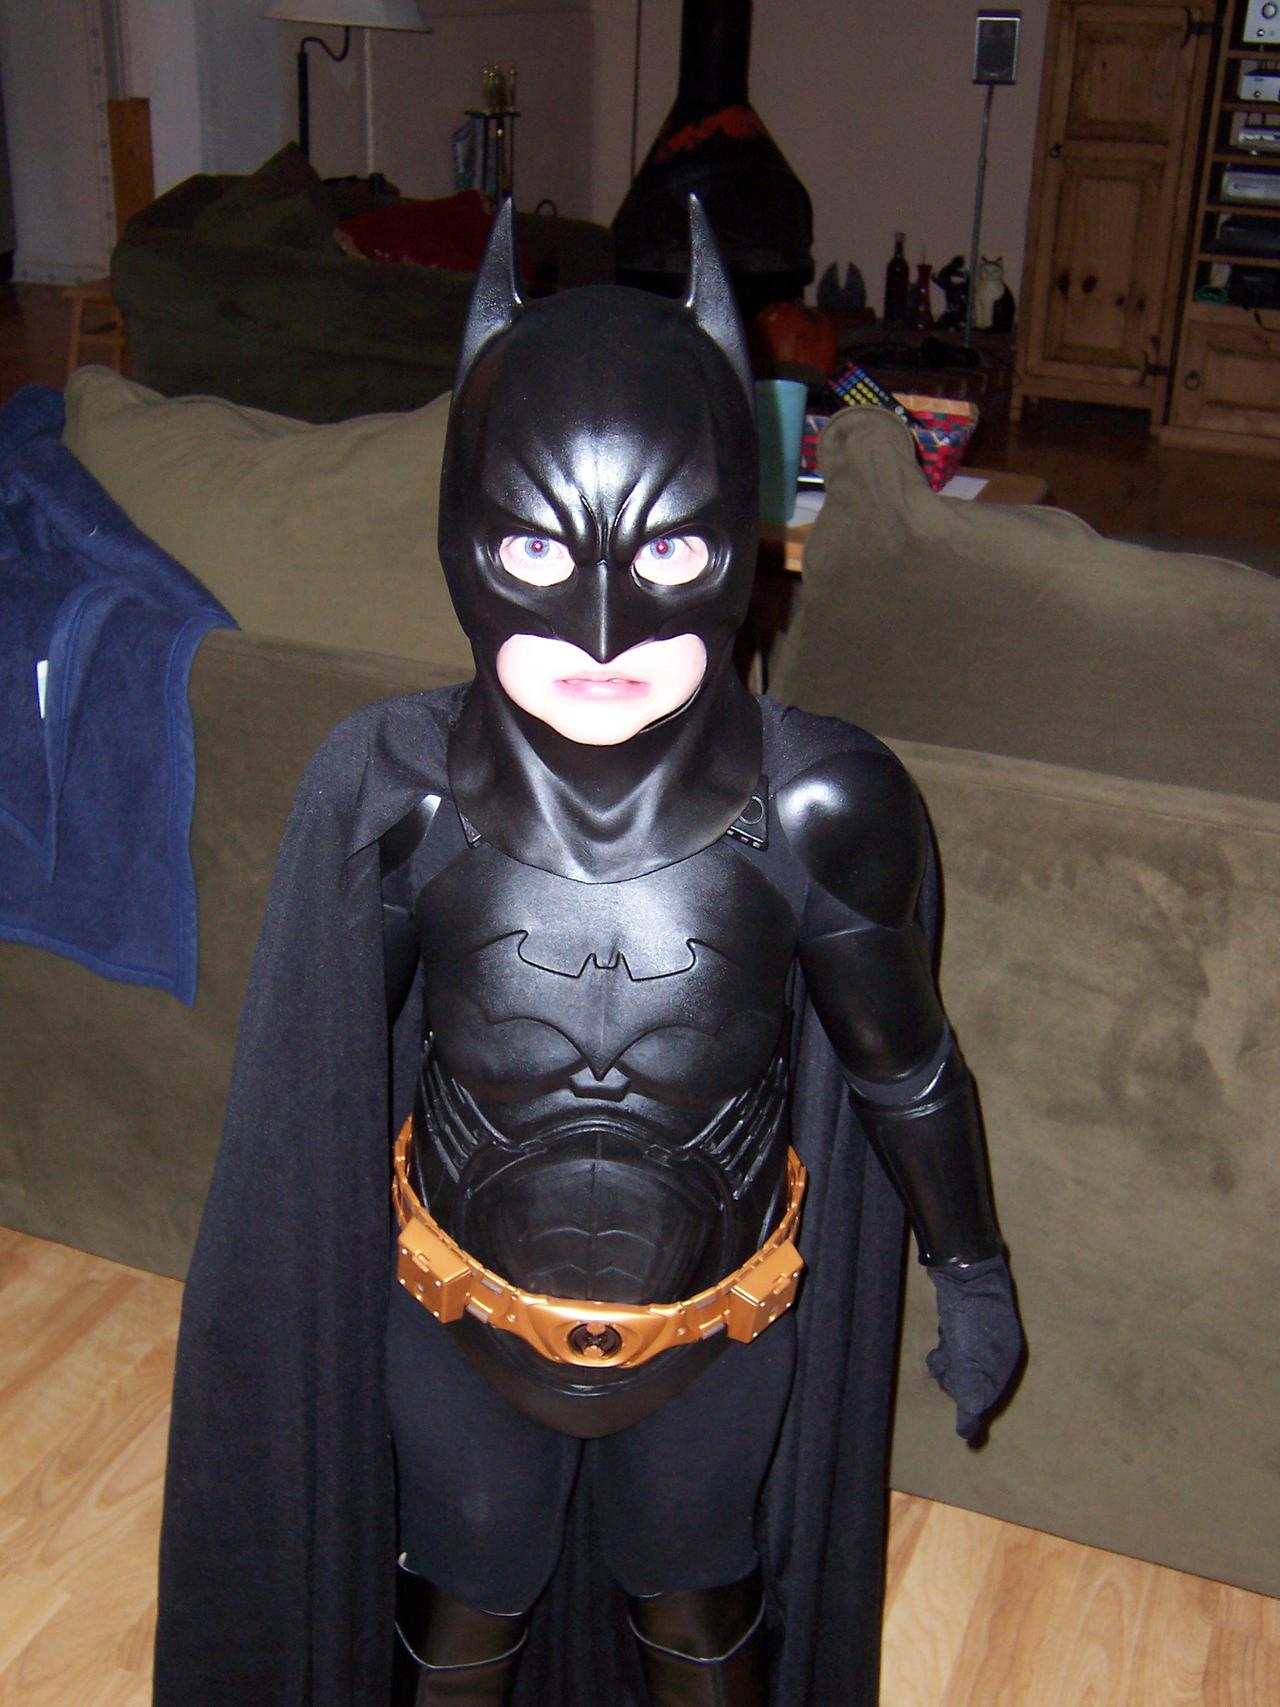 Little Kid Batman Did It